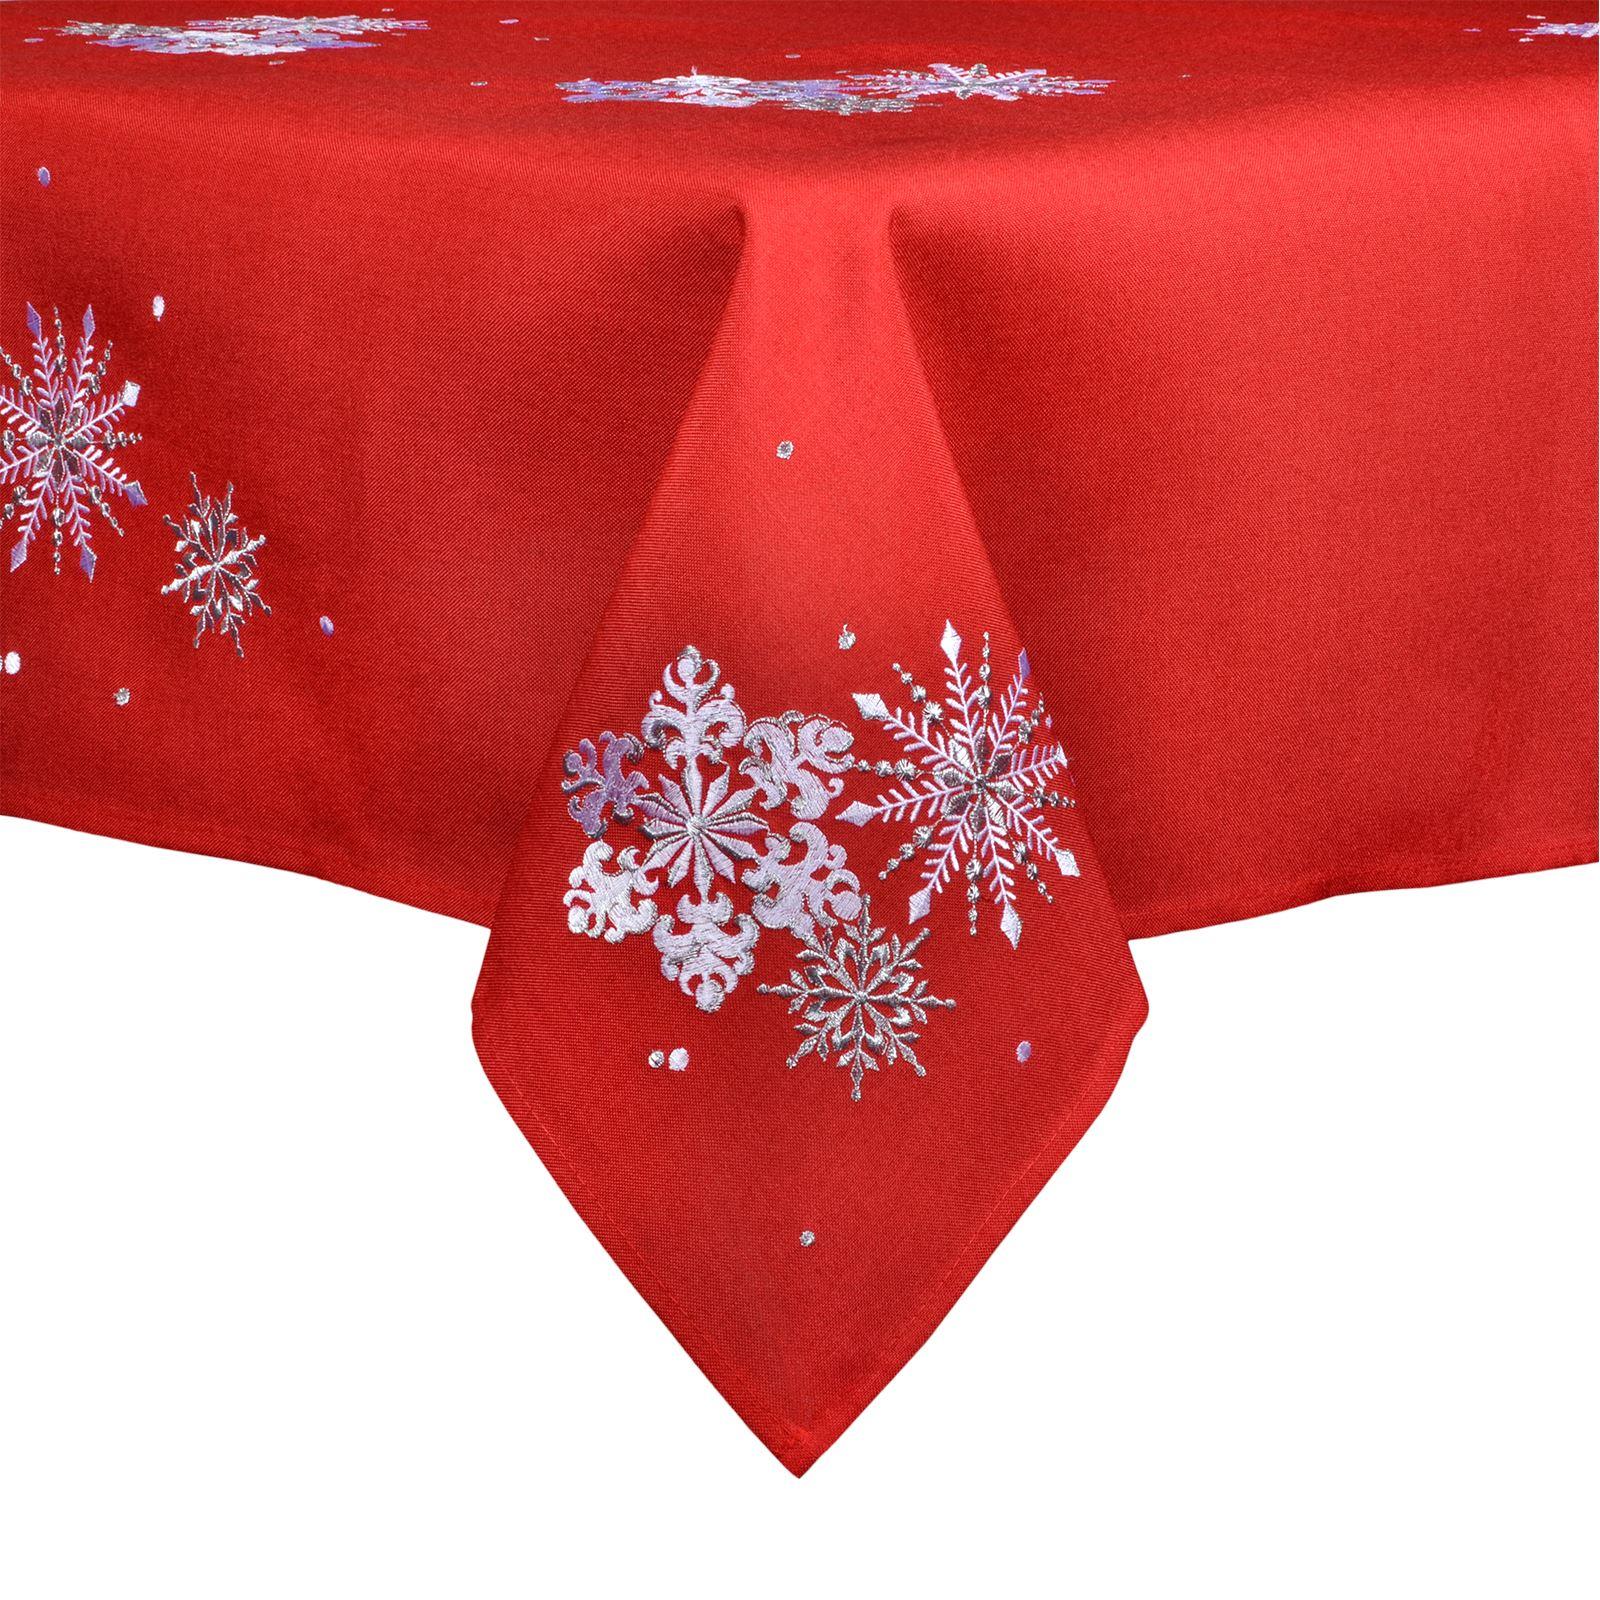 Christmas-Tablecloth-Festive-Pattern-Rectangle-Round-Fabric-Xmas-Room-Decoration Indexbild 36